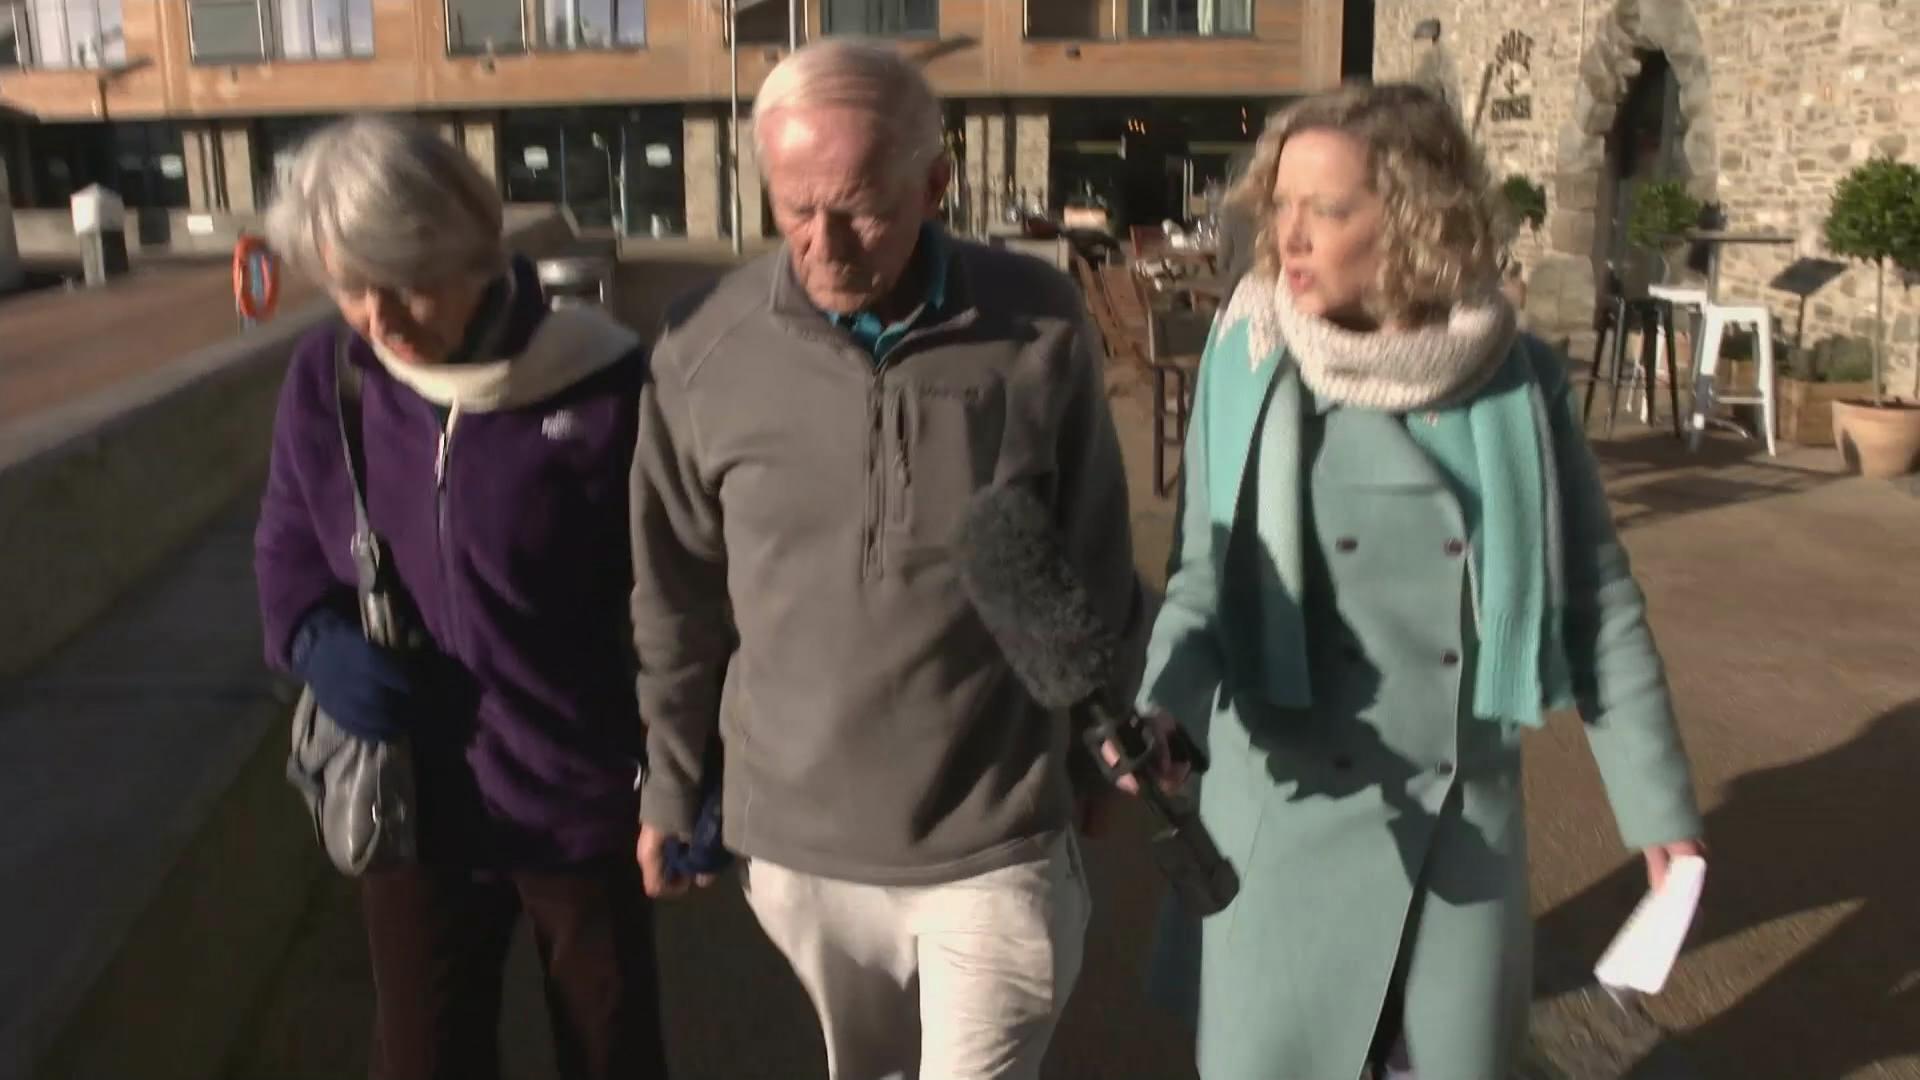 Cathy Newman doorstepping John Smyth